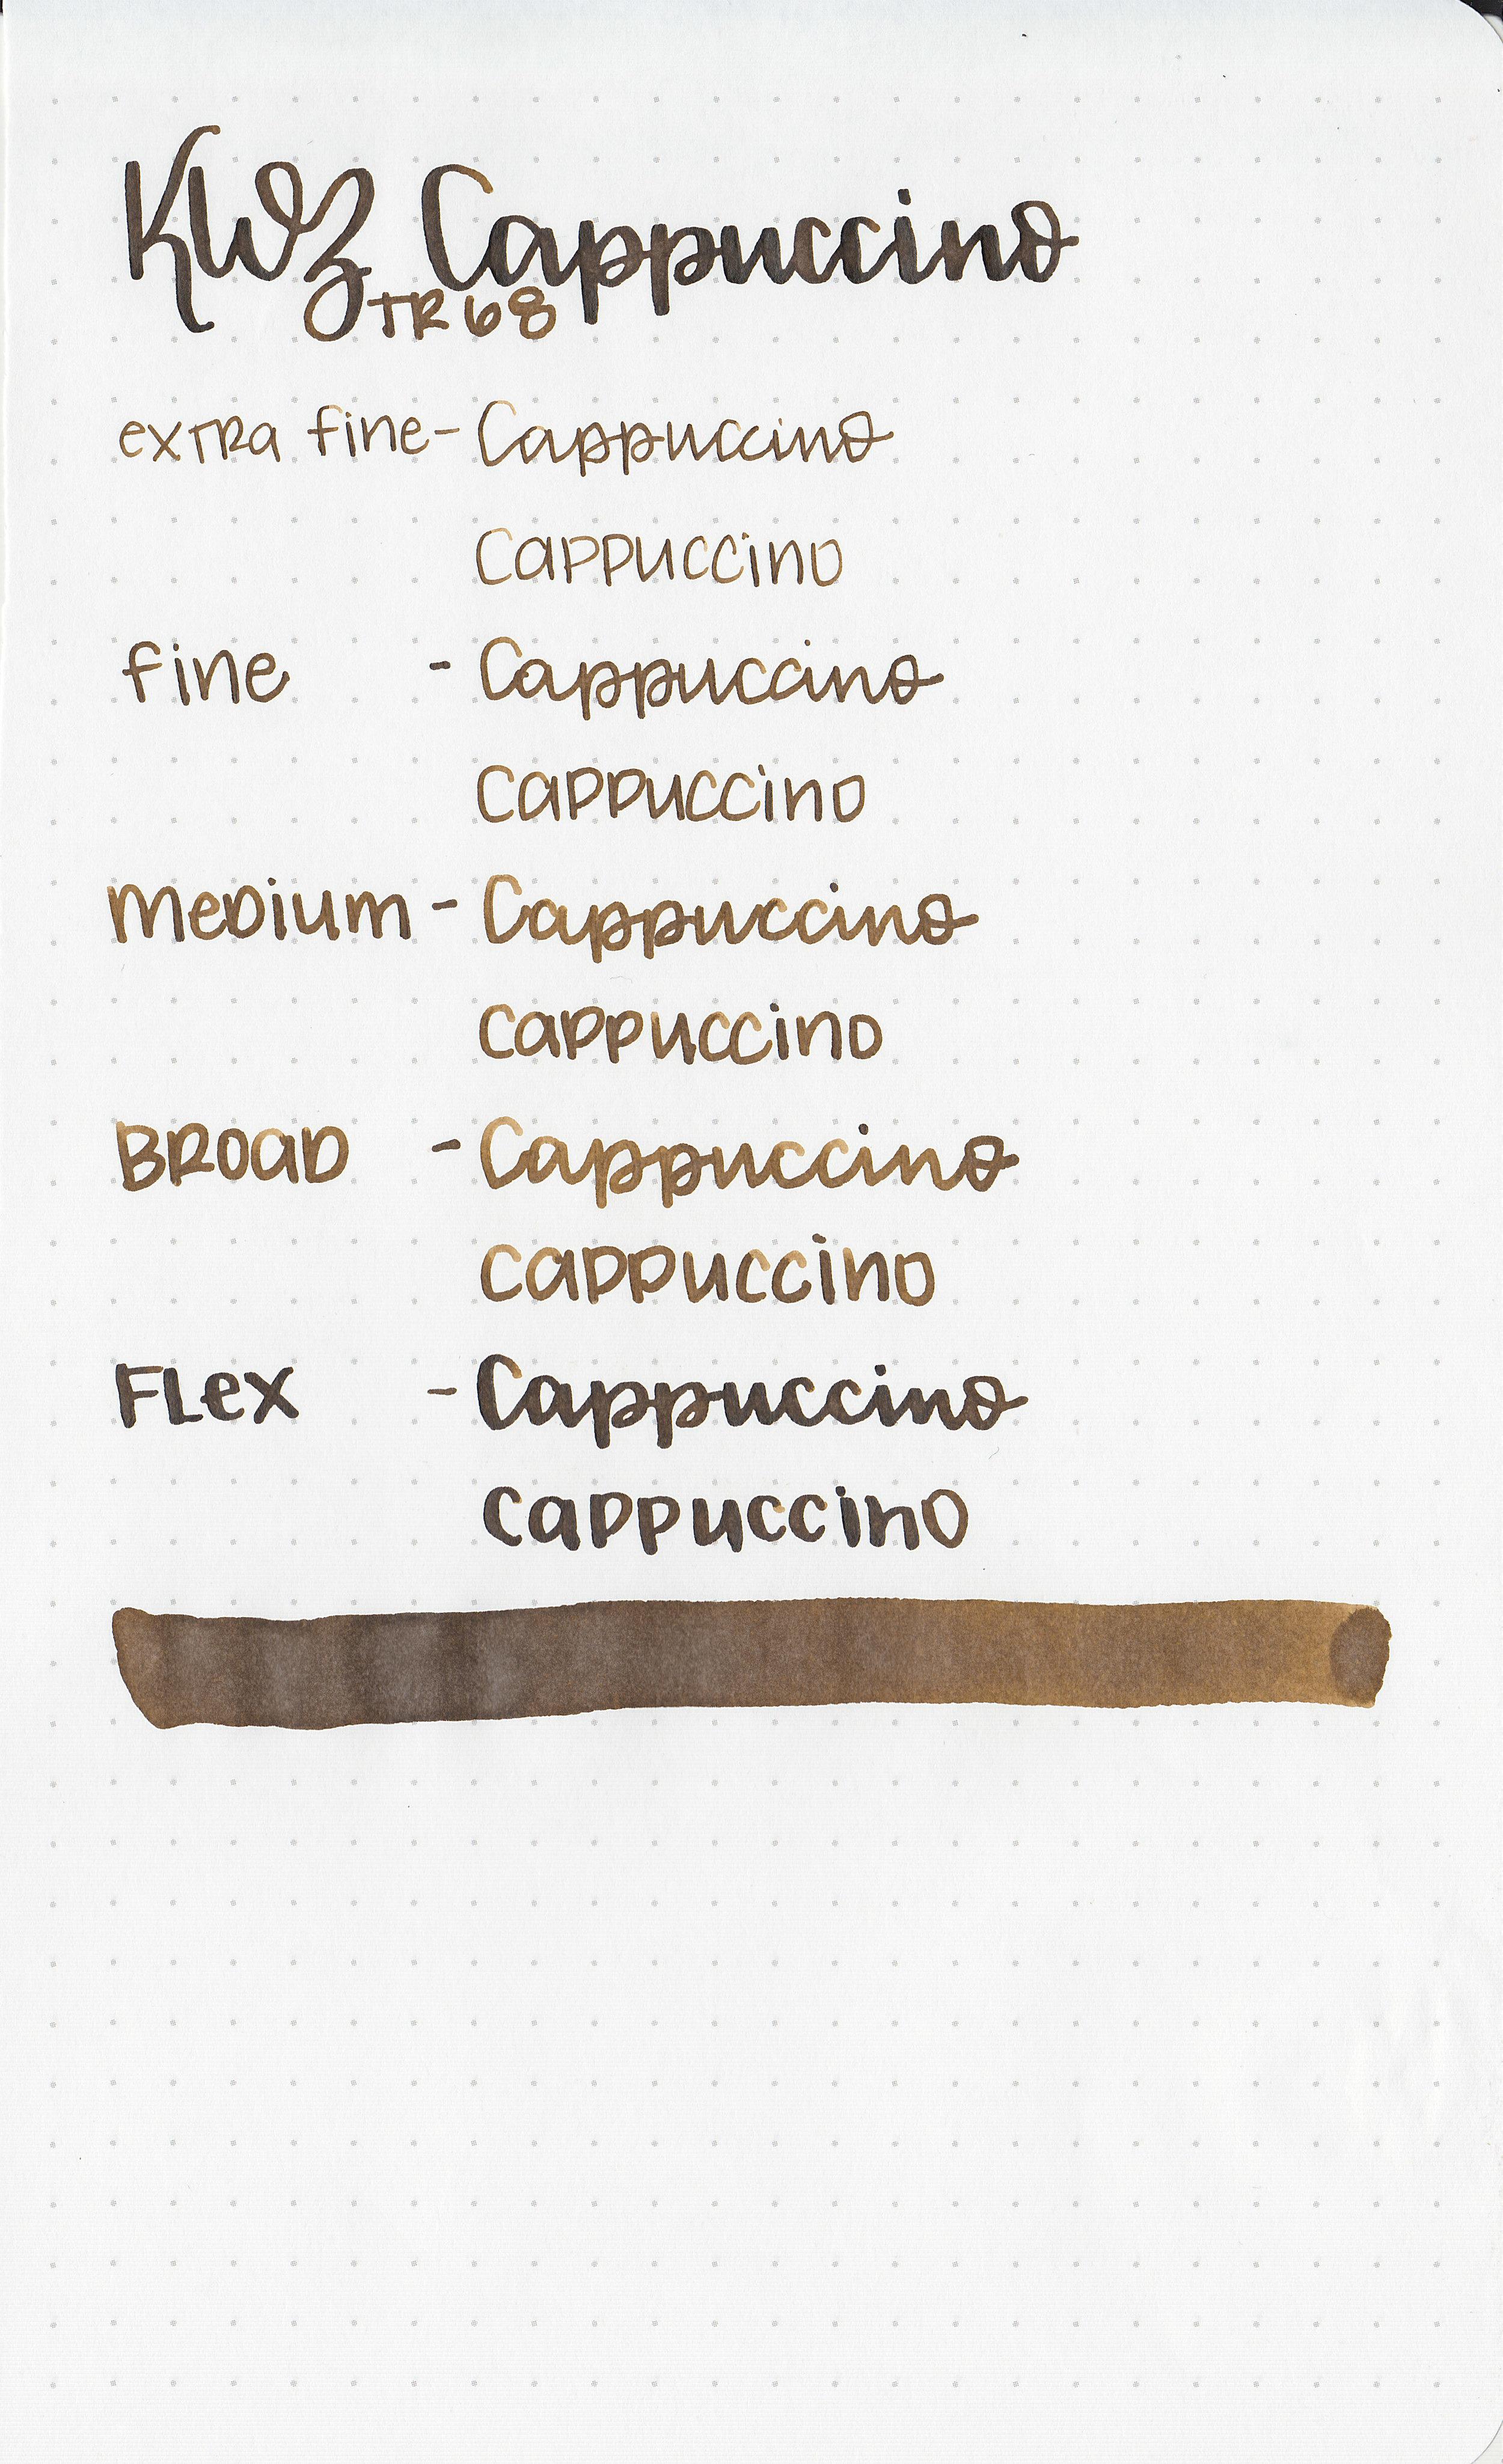 kwz-cappuccino-5.jpg